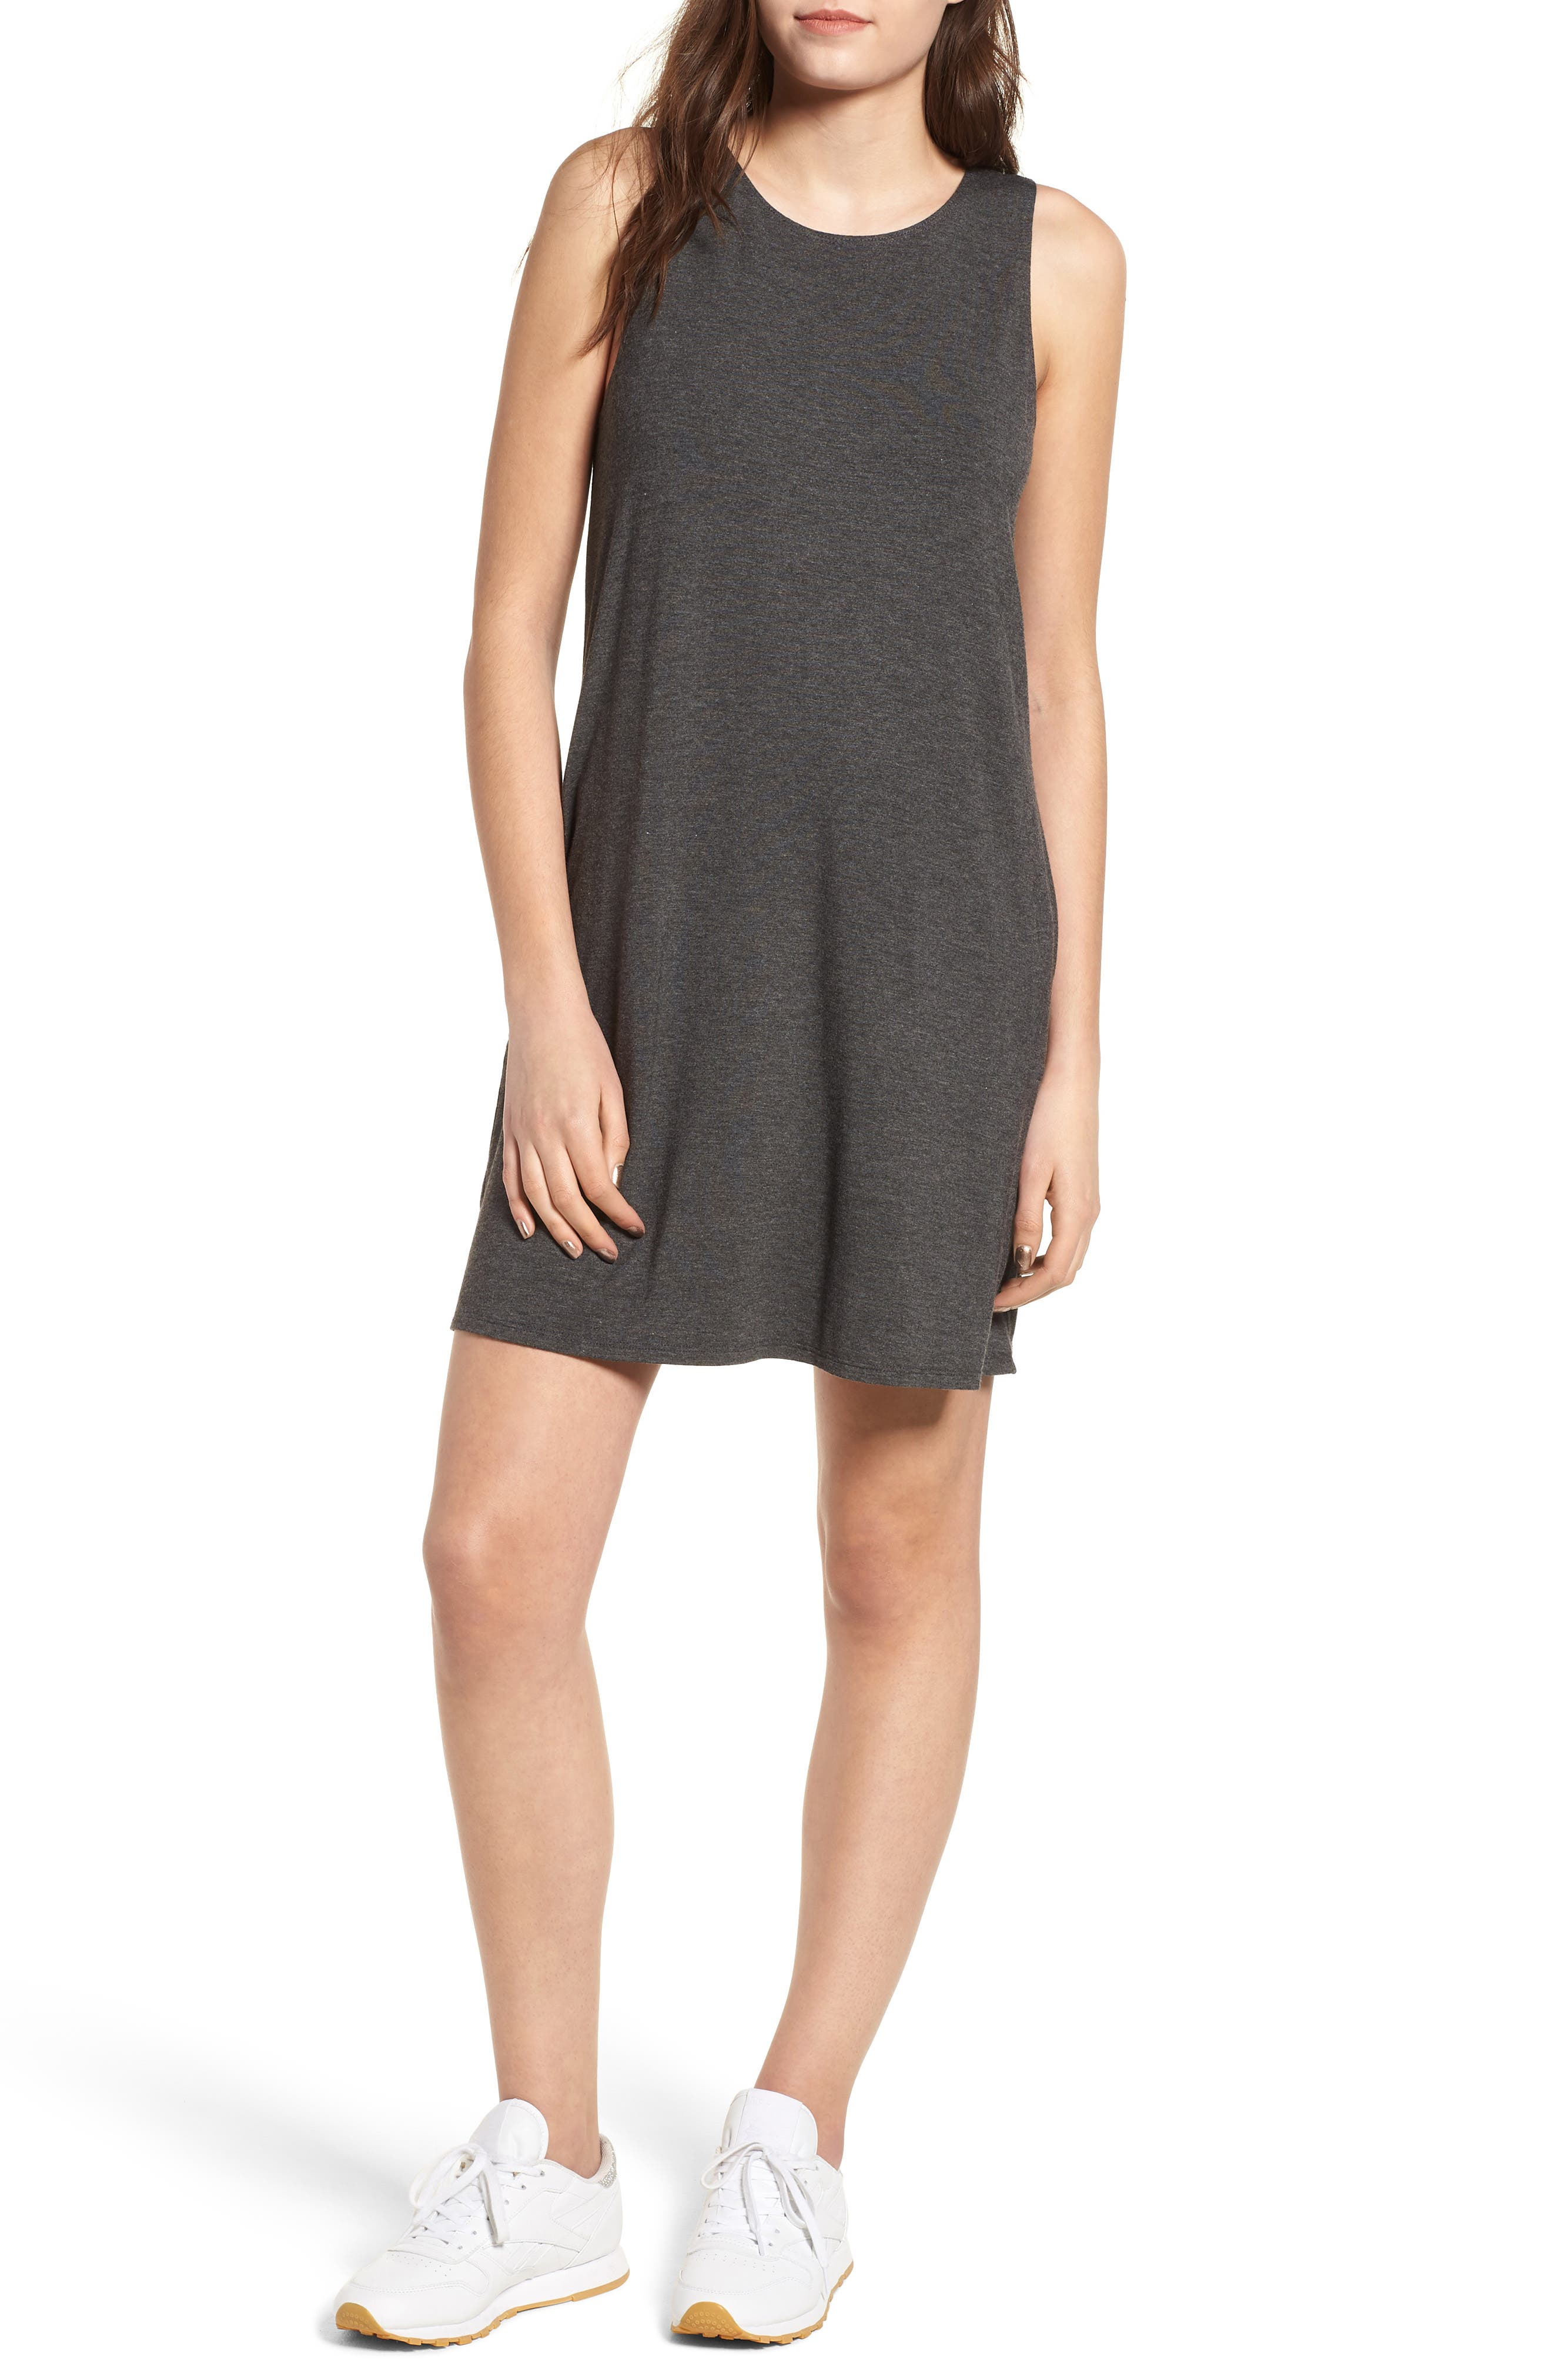 Pocket Tank Dress,                         Main,                         color, Dark Charcoal